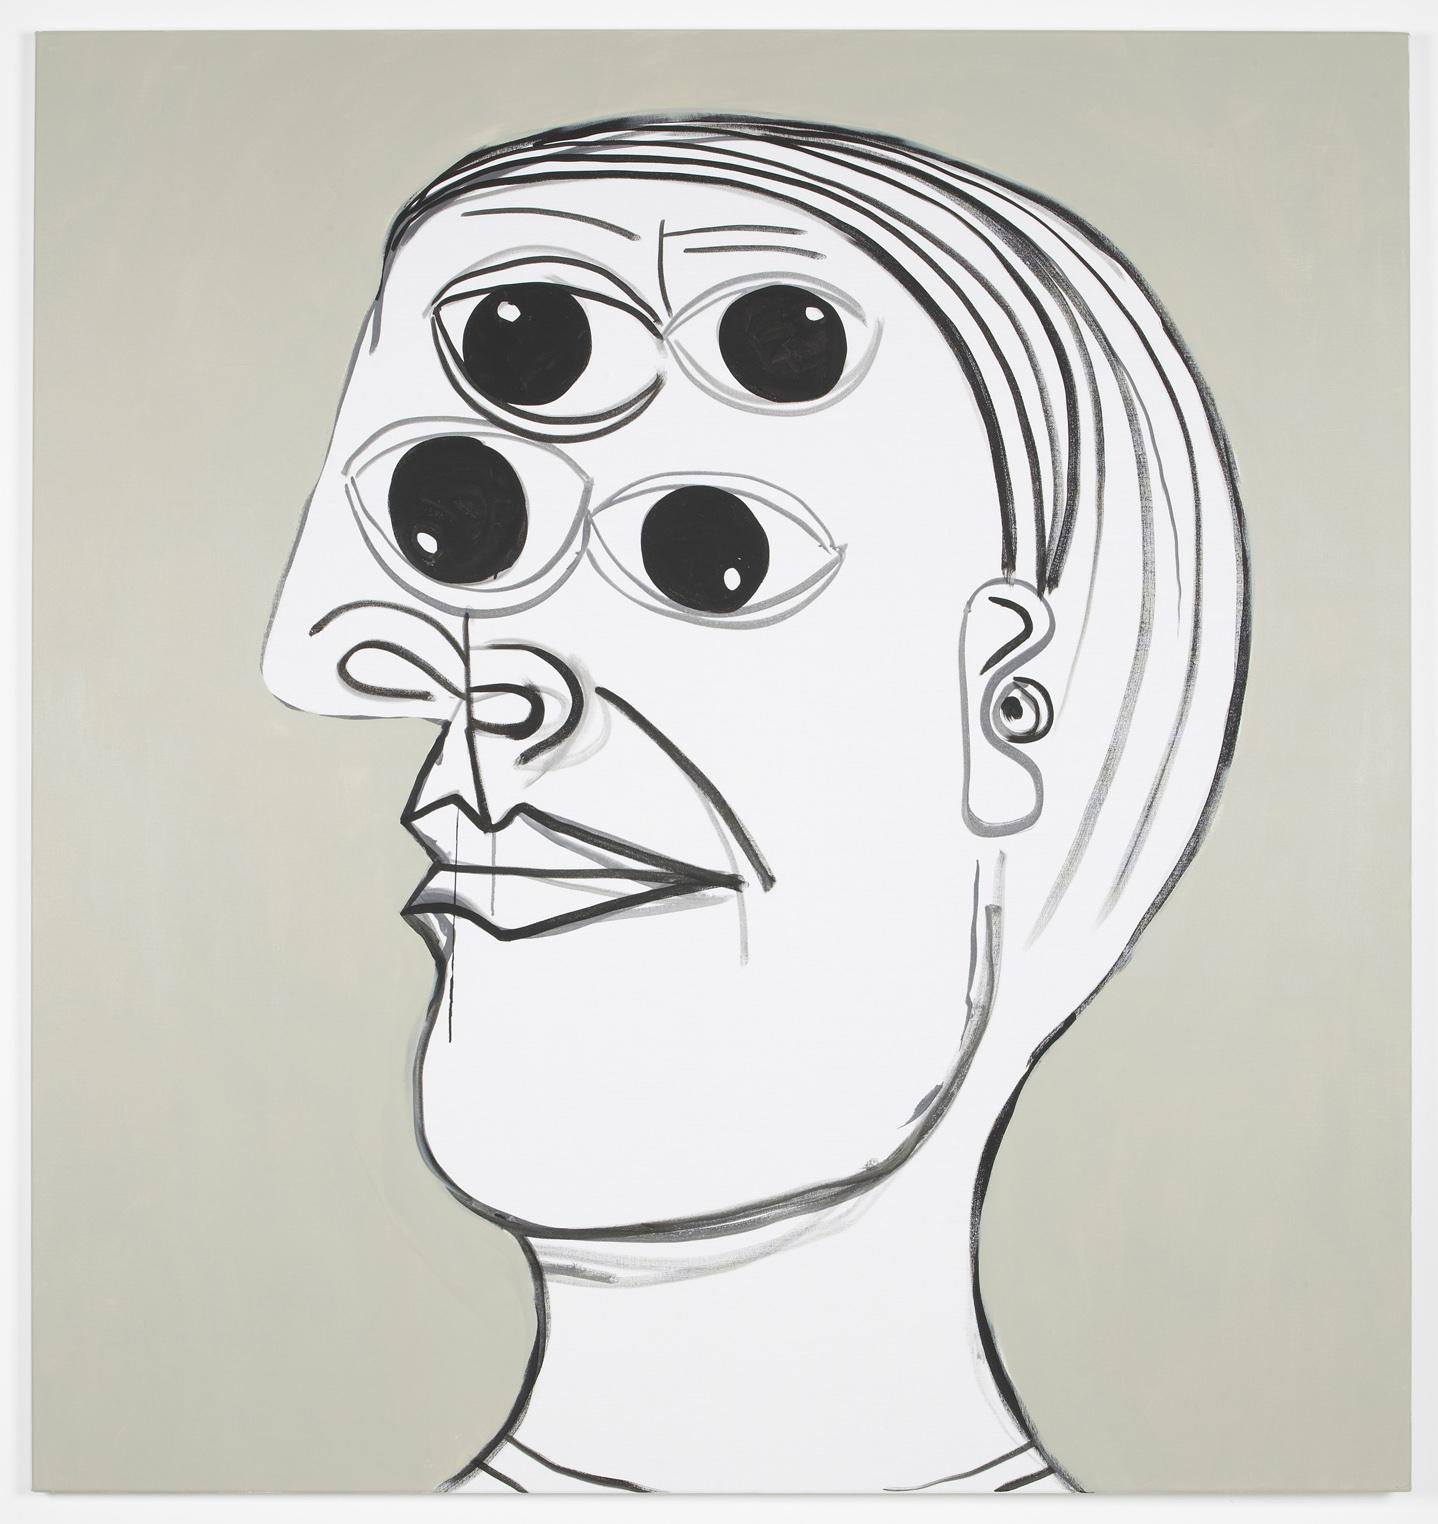 Four Eyes  2012  Acrylic on canvas  160 x 150 cm / 62.9 x 59 in